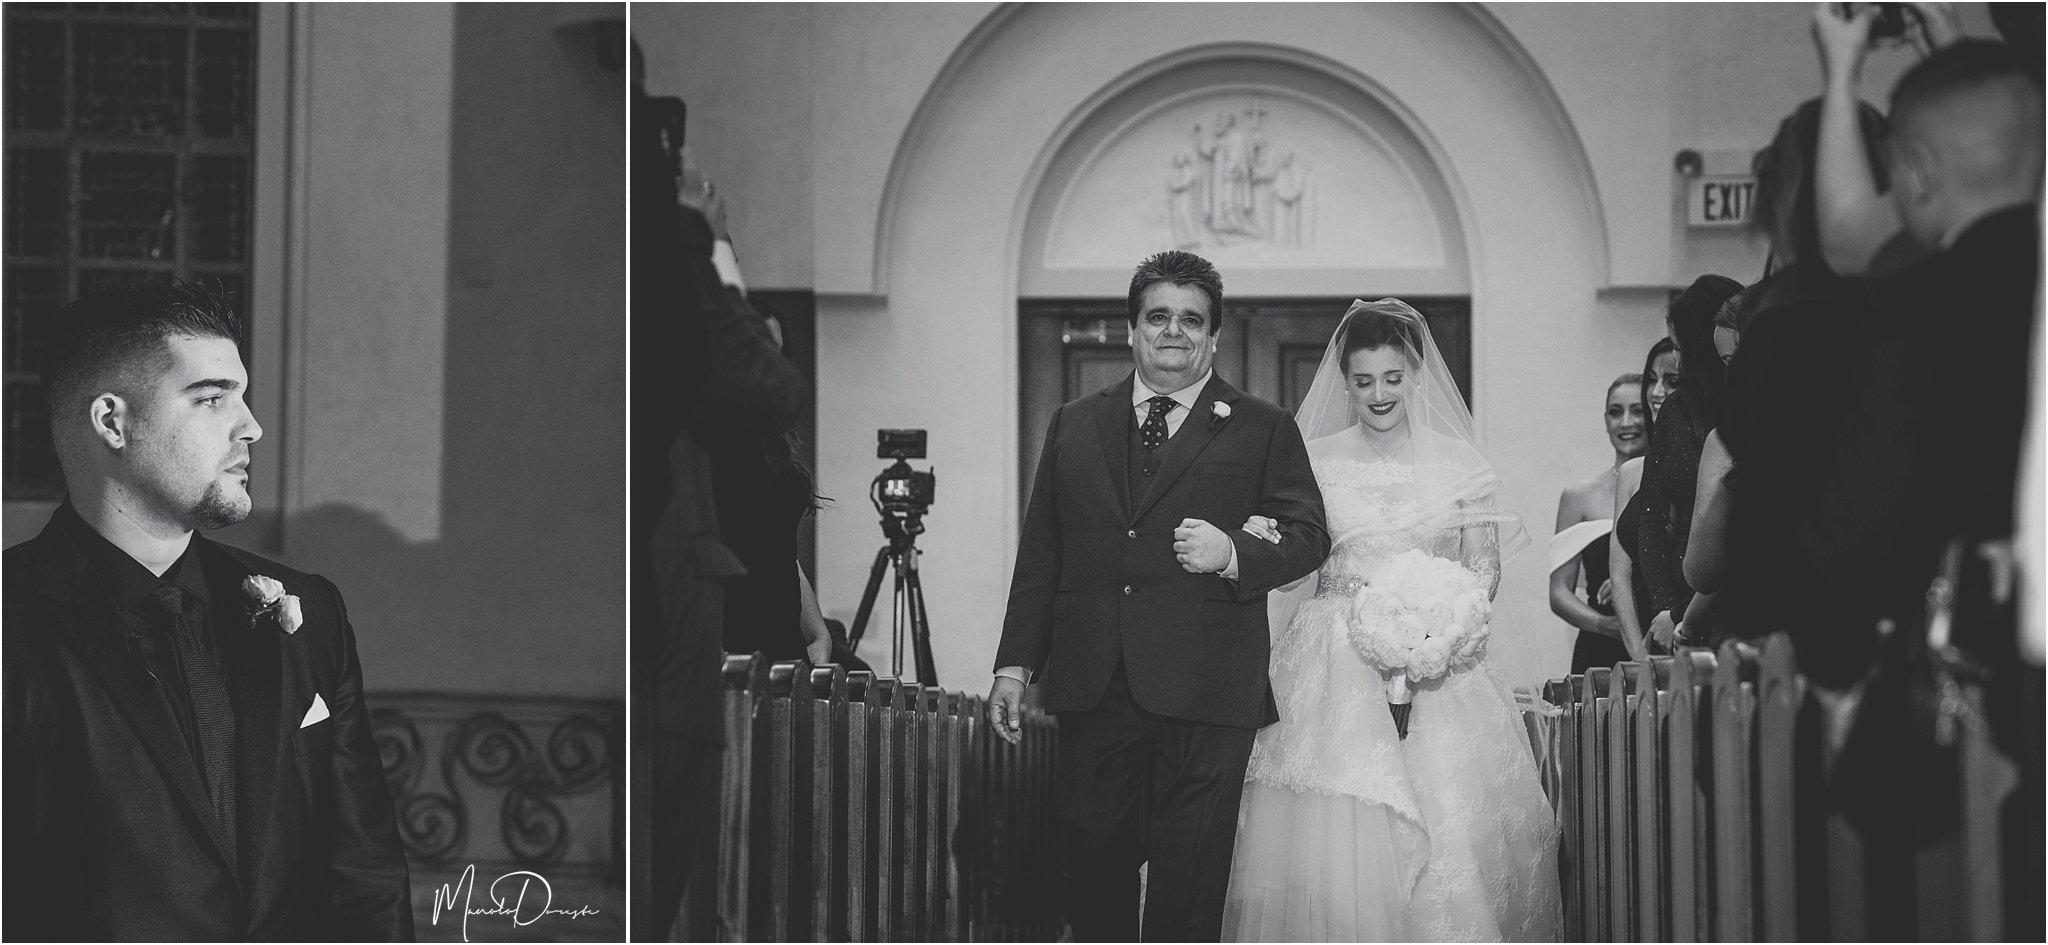 00961_ManoloDoreste_InFocusStudios_Wedding_Family_Photography_Miami_MiamiPhotographer.jpg